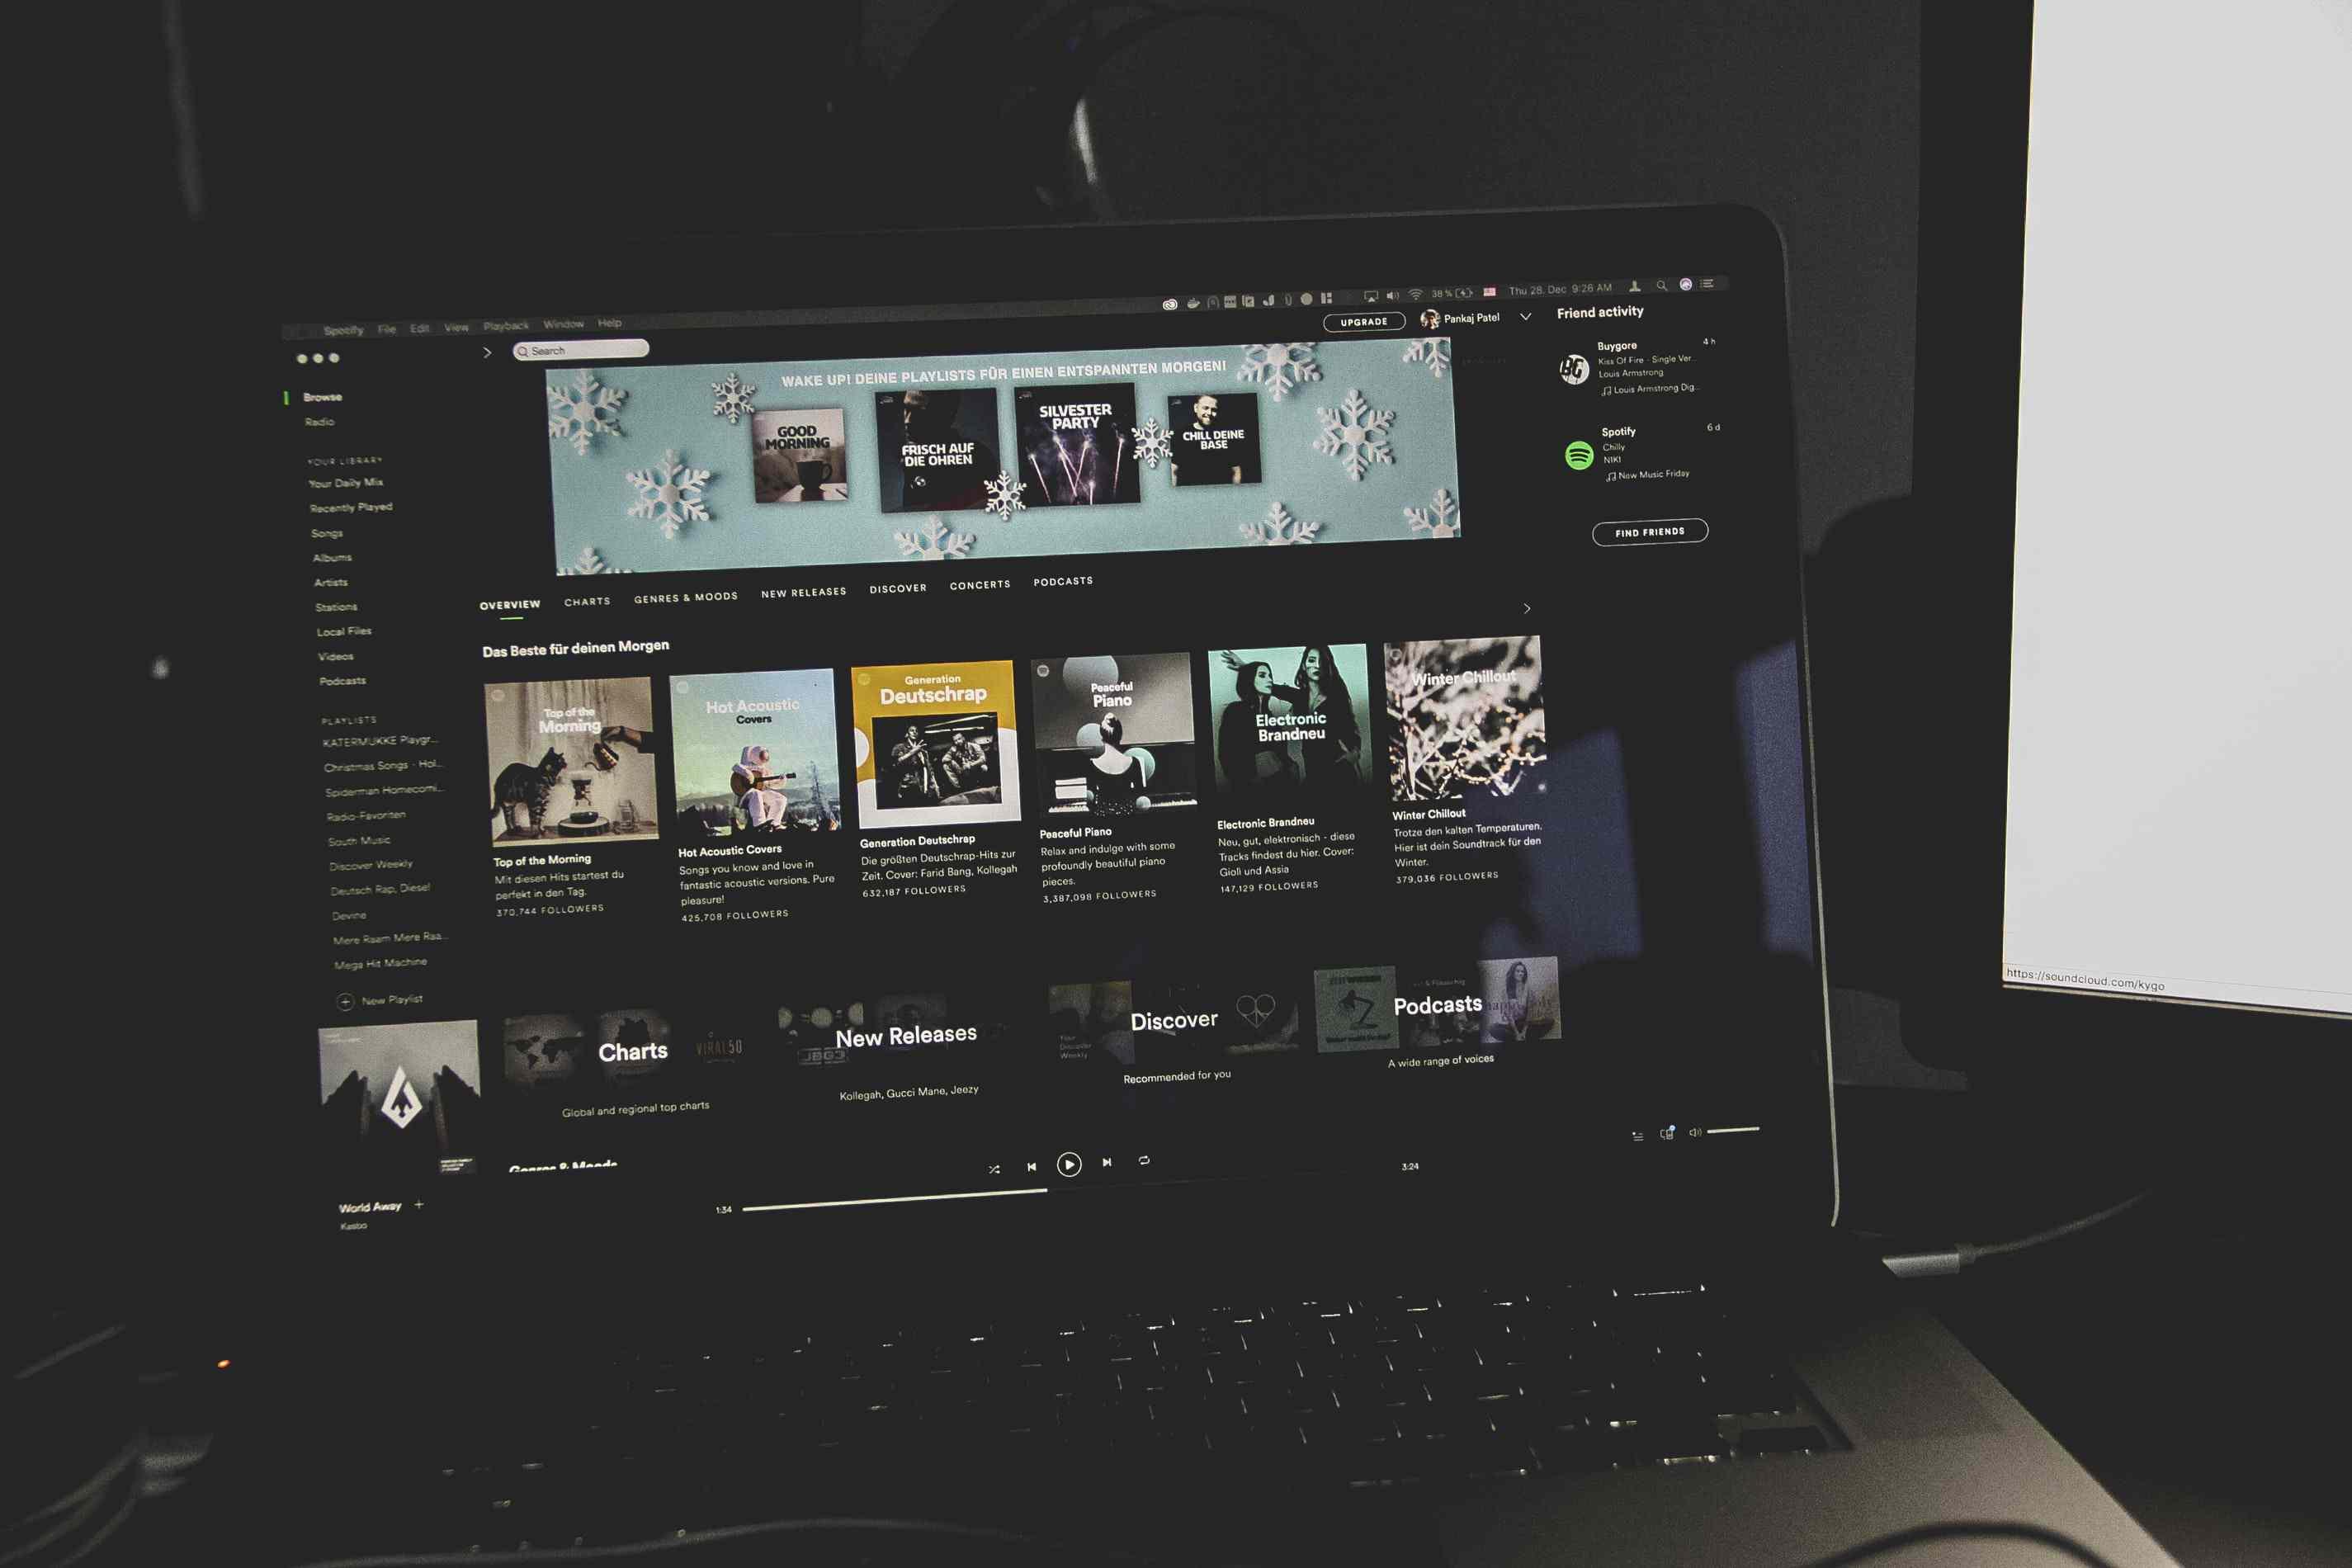 Spotify on a MacBook